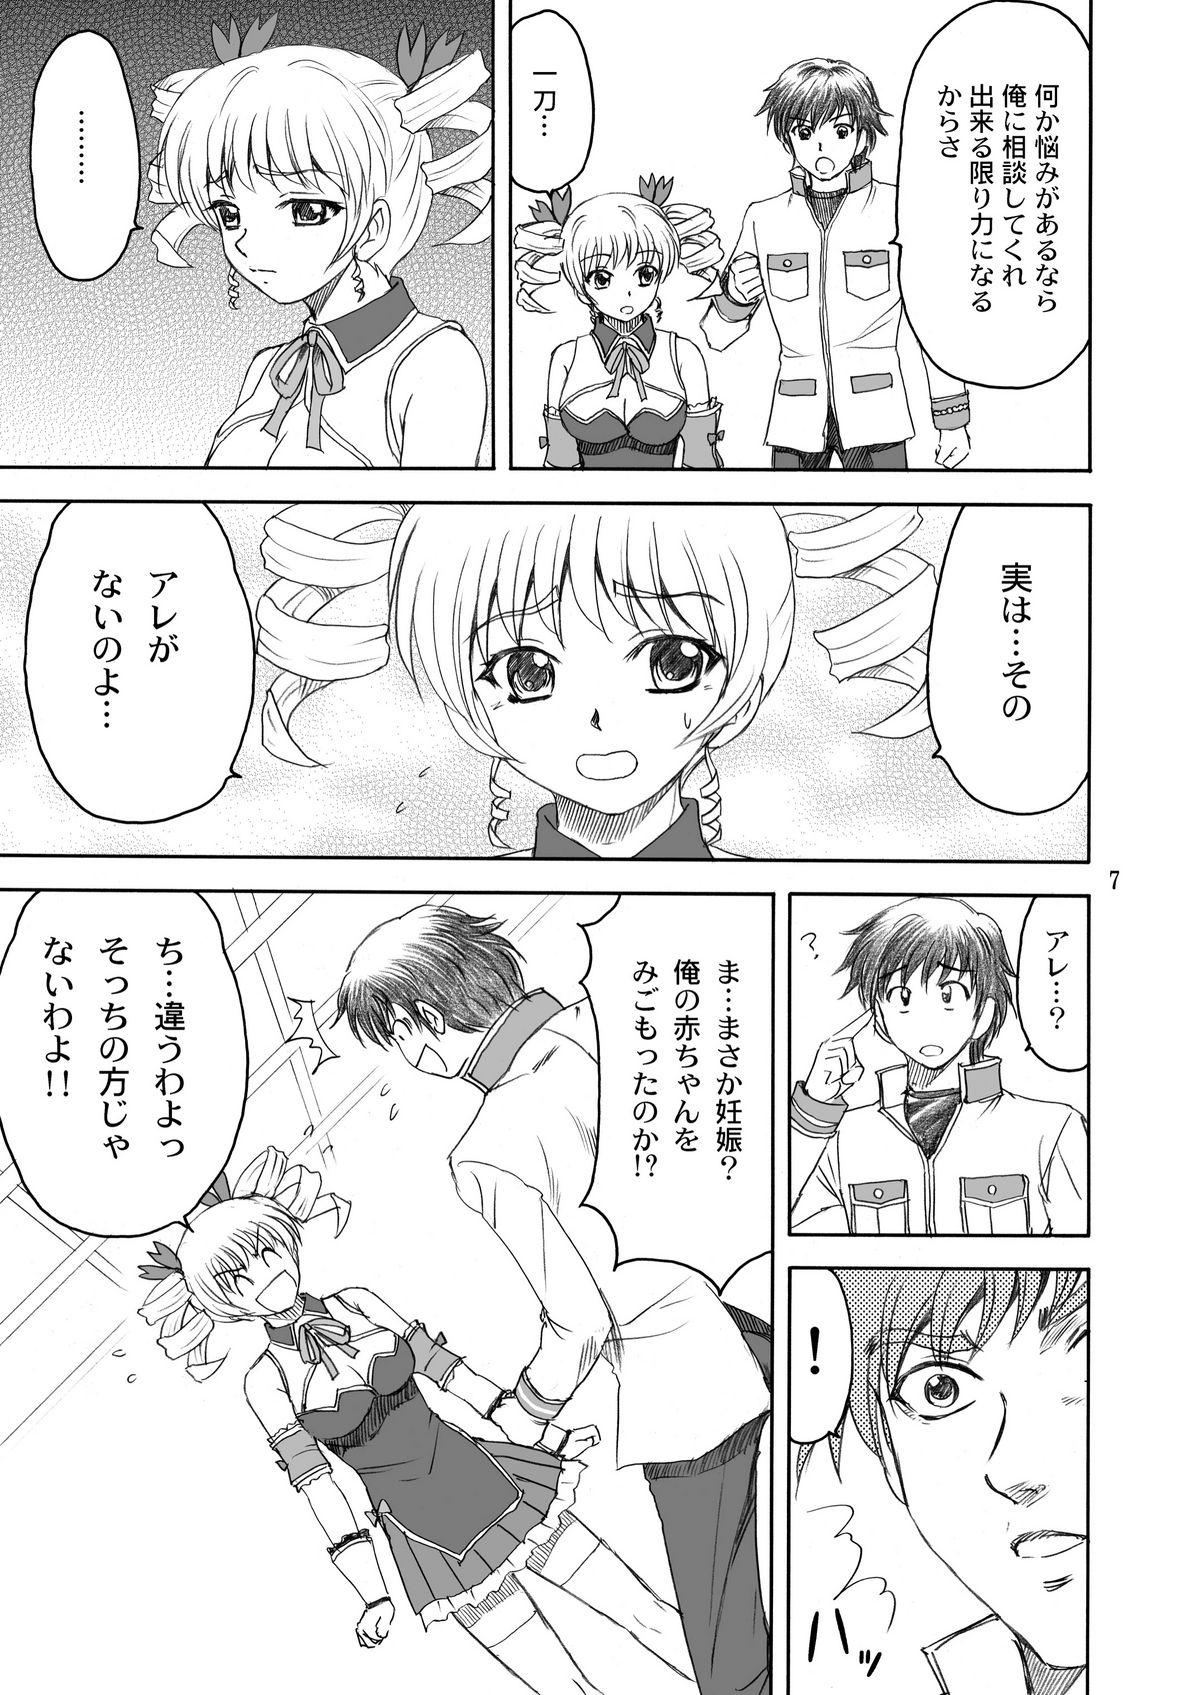 Karin-sama Otsuujiteki Jijou 6